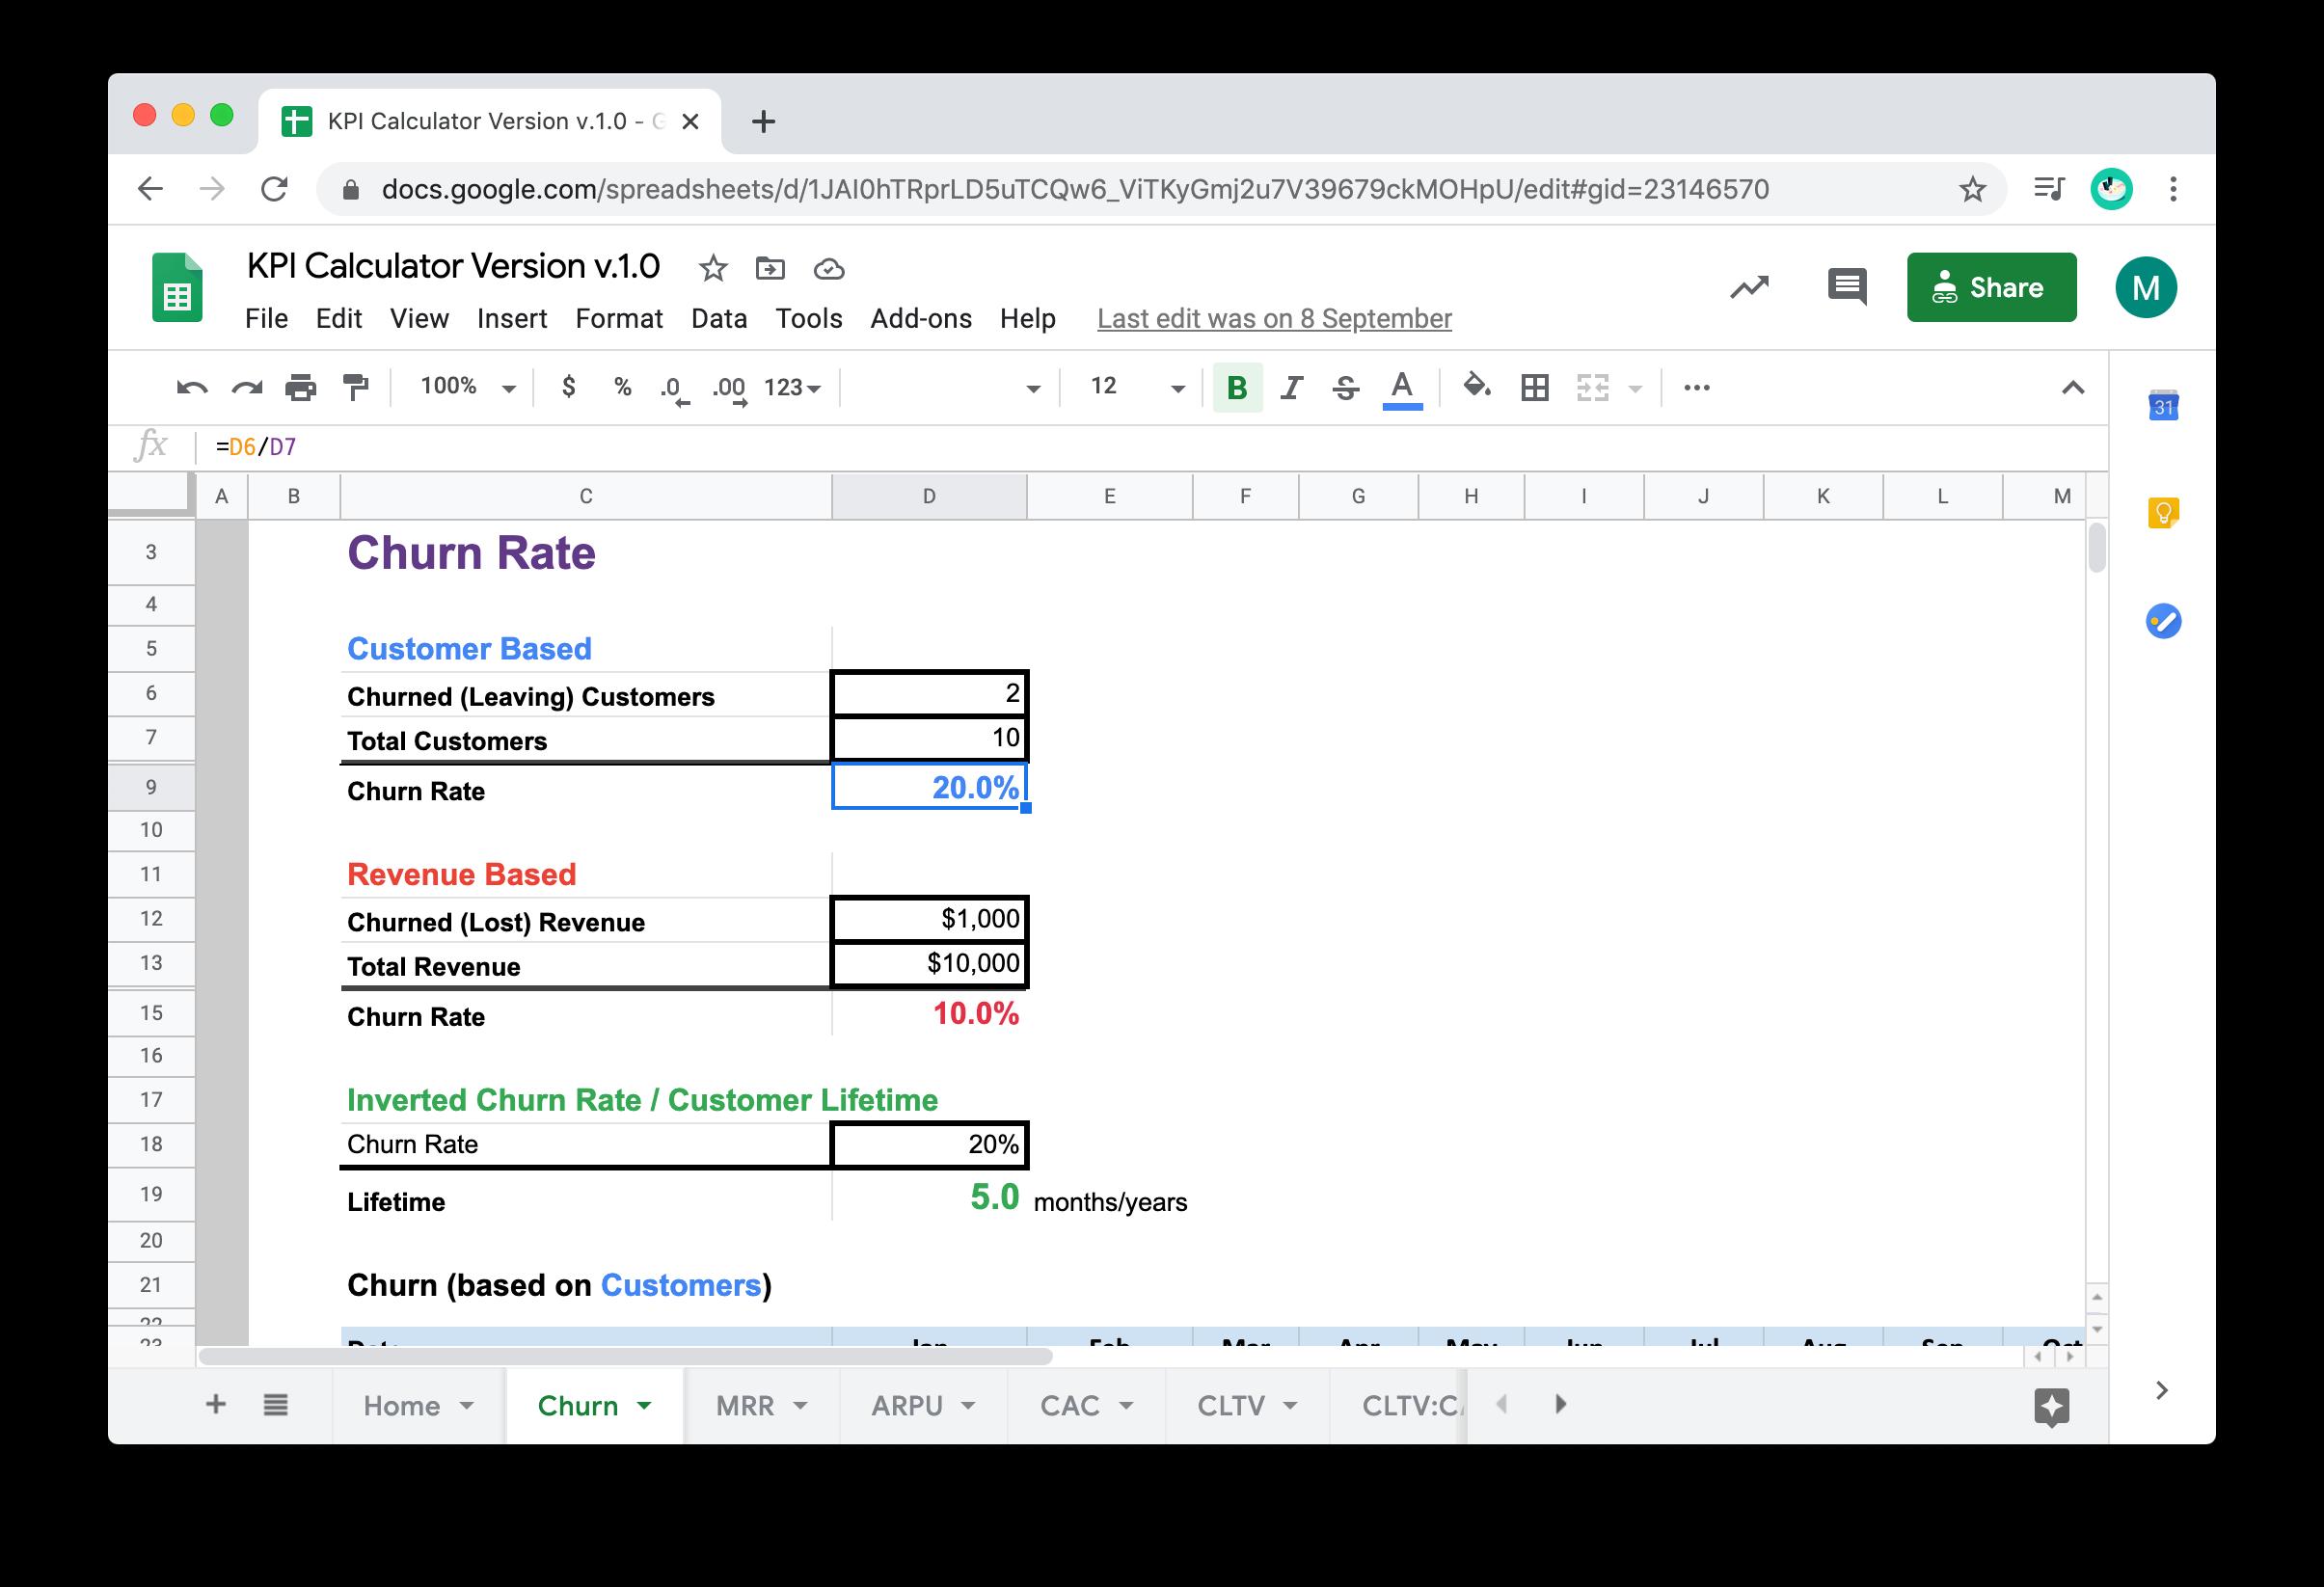 KPI Calculator Version v.1.0 - Google Sheets 2020-11-03 20-21-04